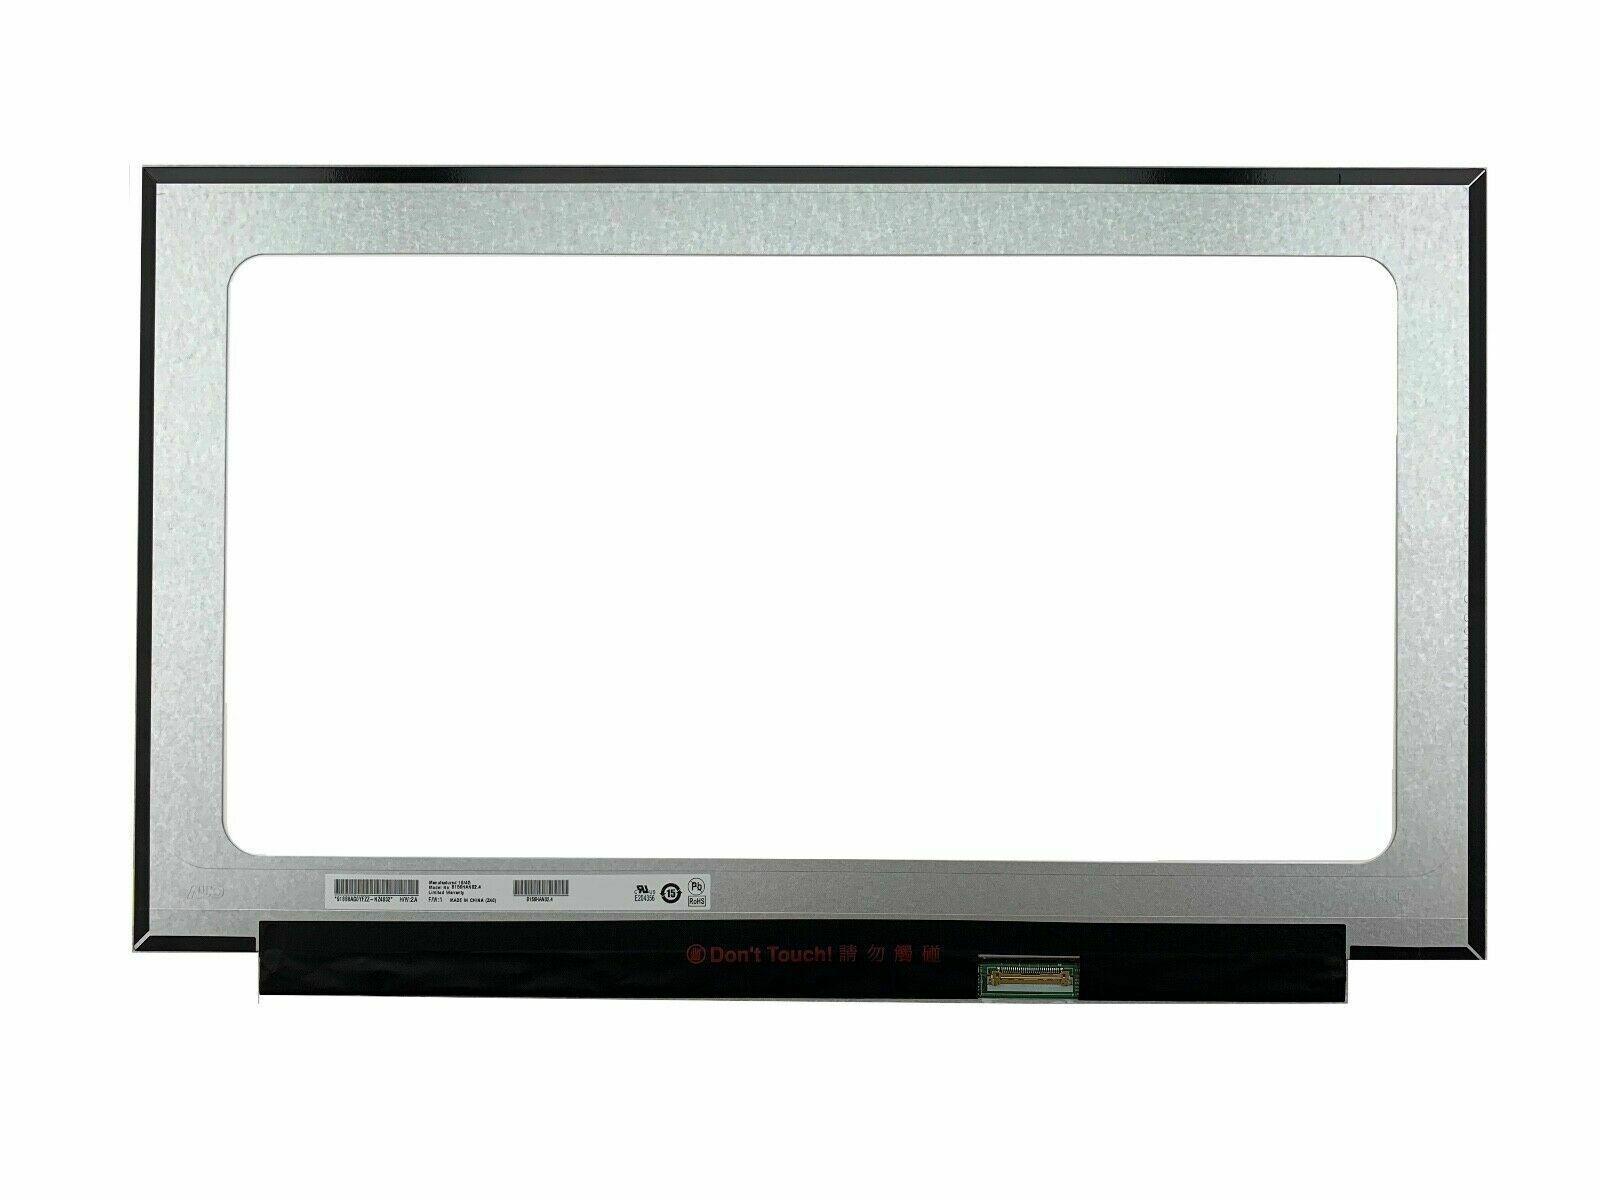 L25977-001 - HP LCD Panel 14'Inch FHD AG LED Uwva - $94.03